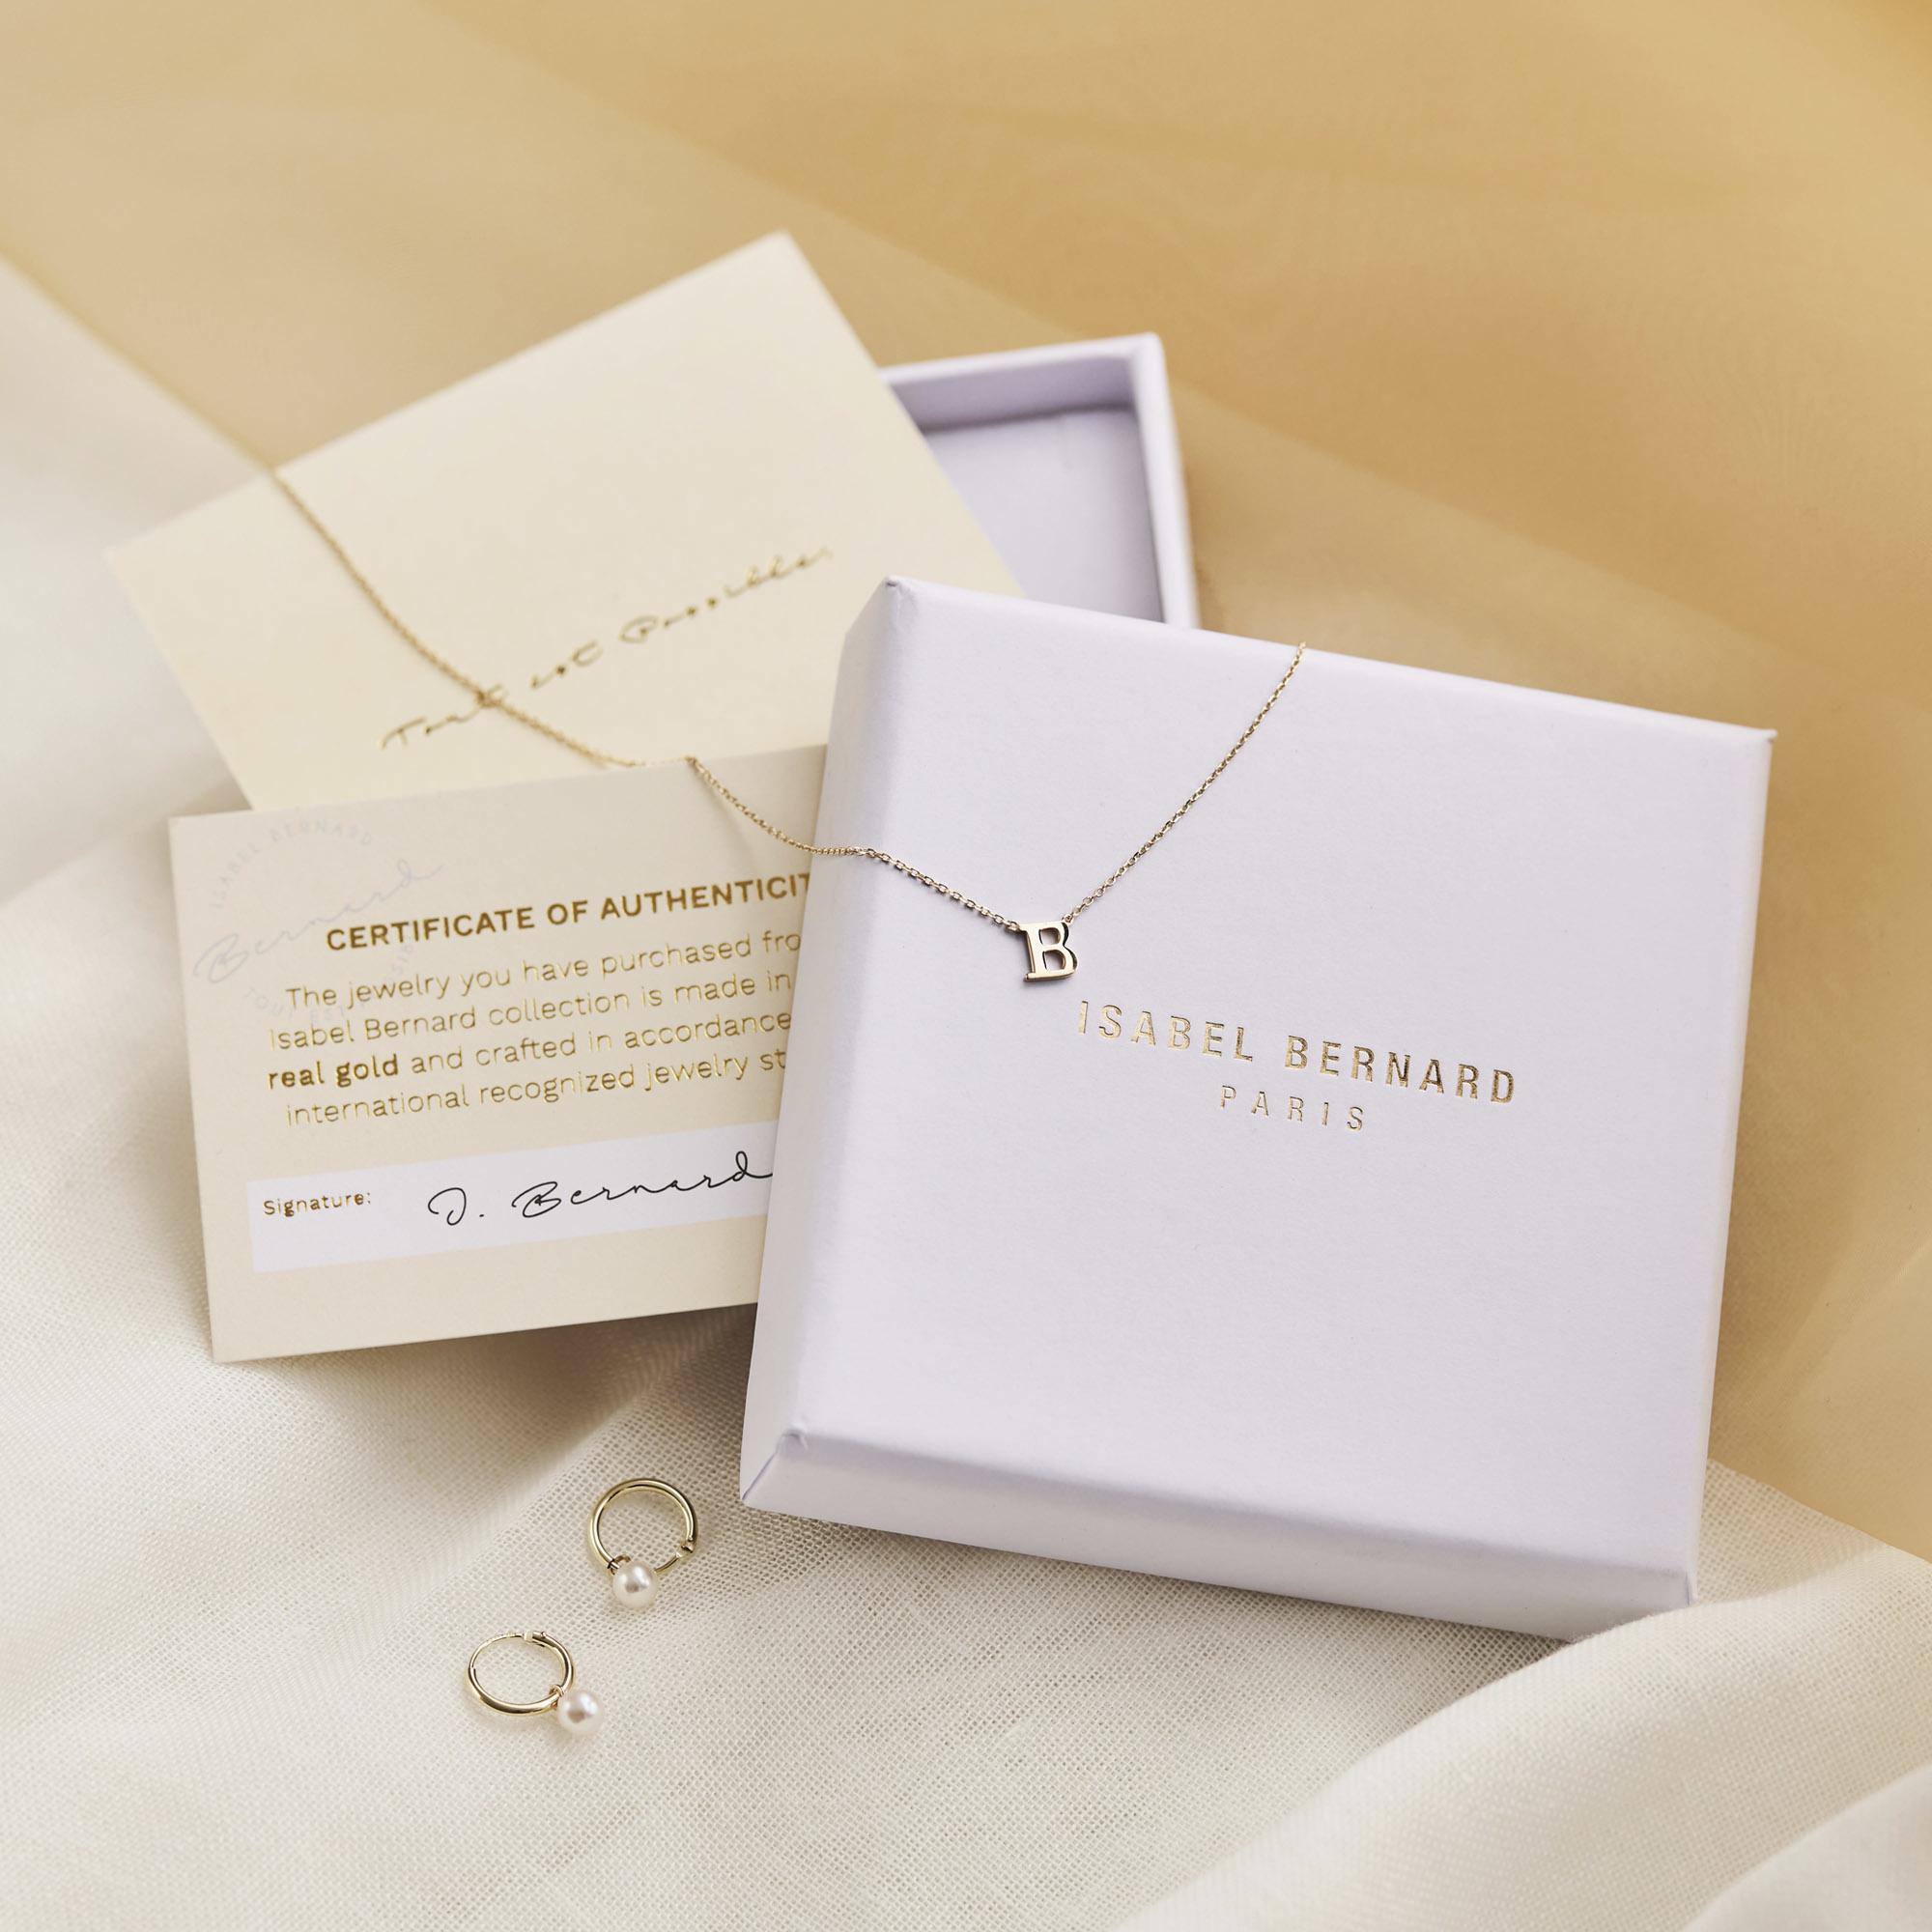 Isabel Bernard Le Marais Loulou 14 karat gold necklace with rings